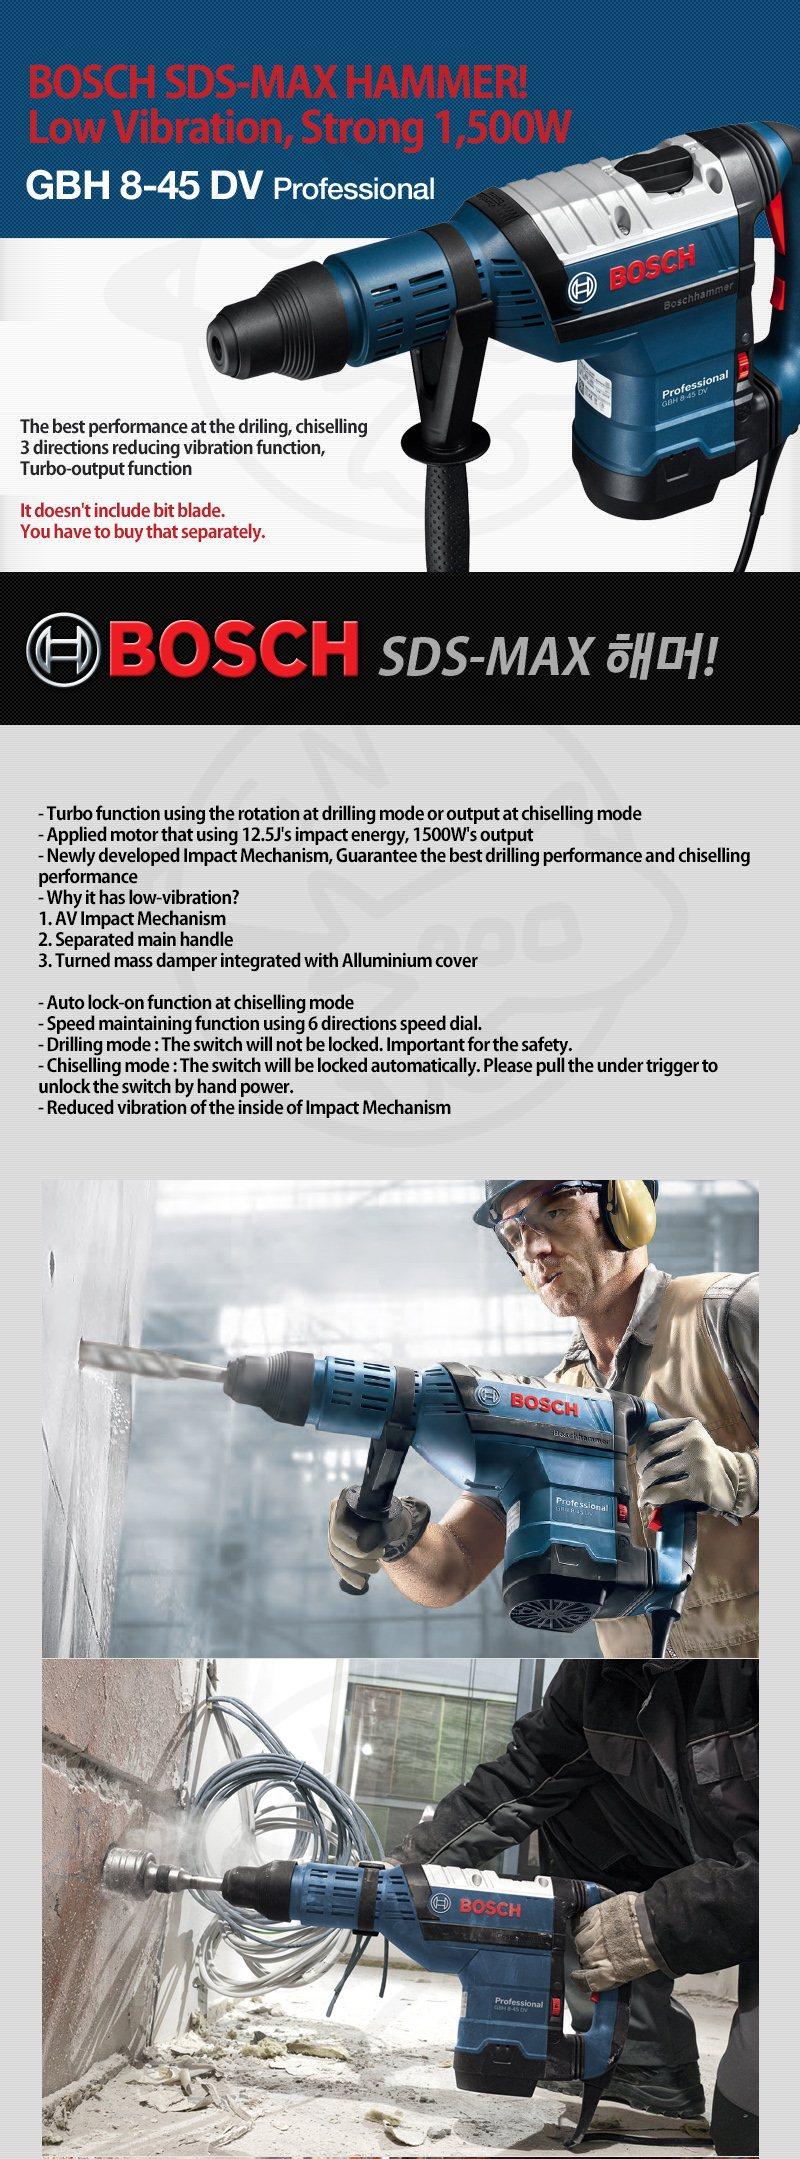 Bosch GBH 8-45 DV Professional SDS MAX Hammer Low Vibration